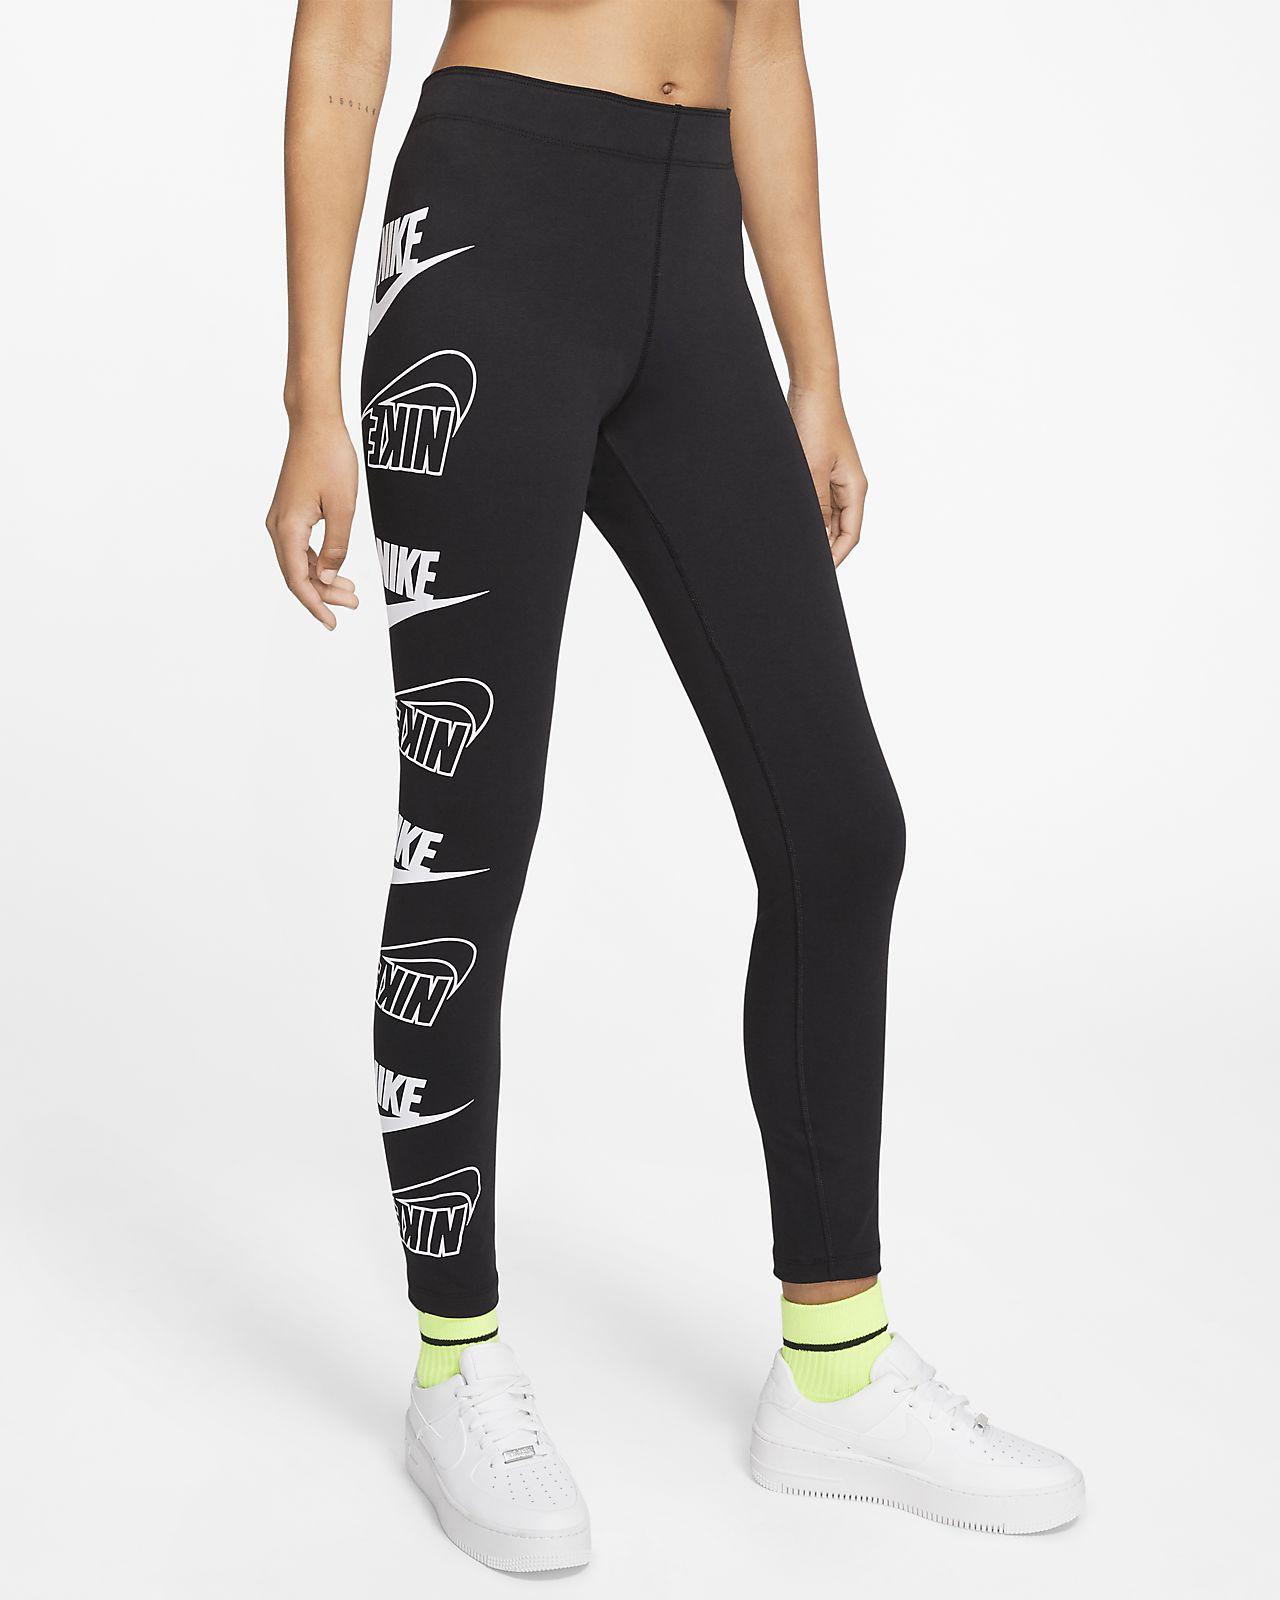 Leggings Nike Sportswear Leg-A-See för kvinnor